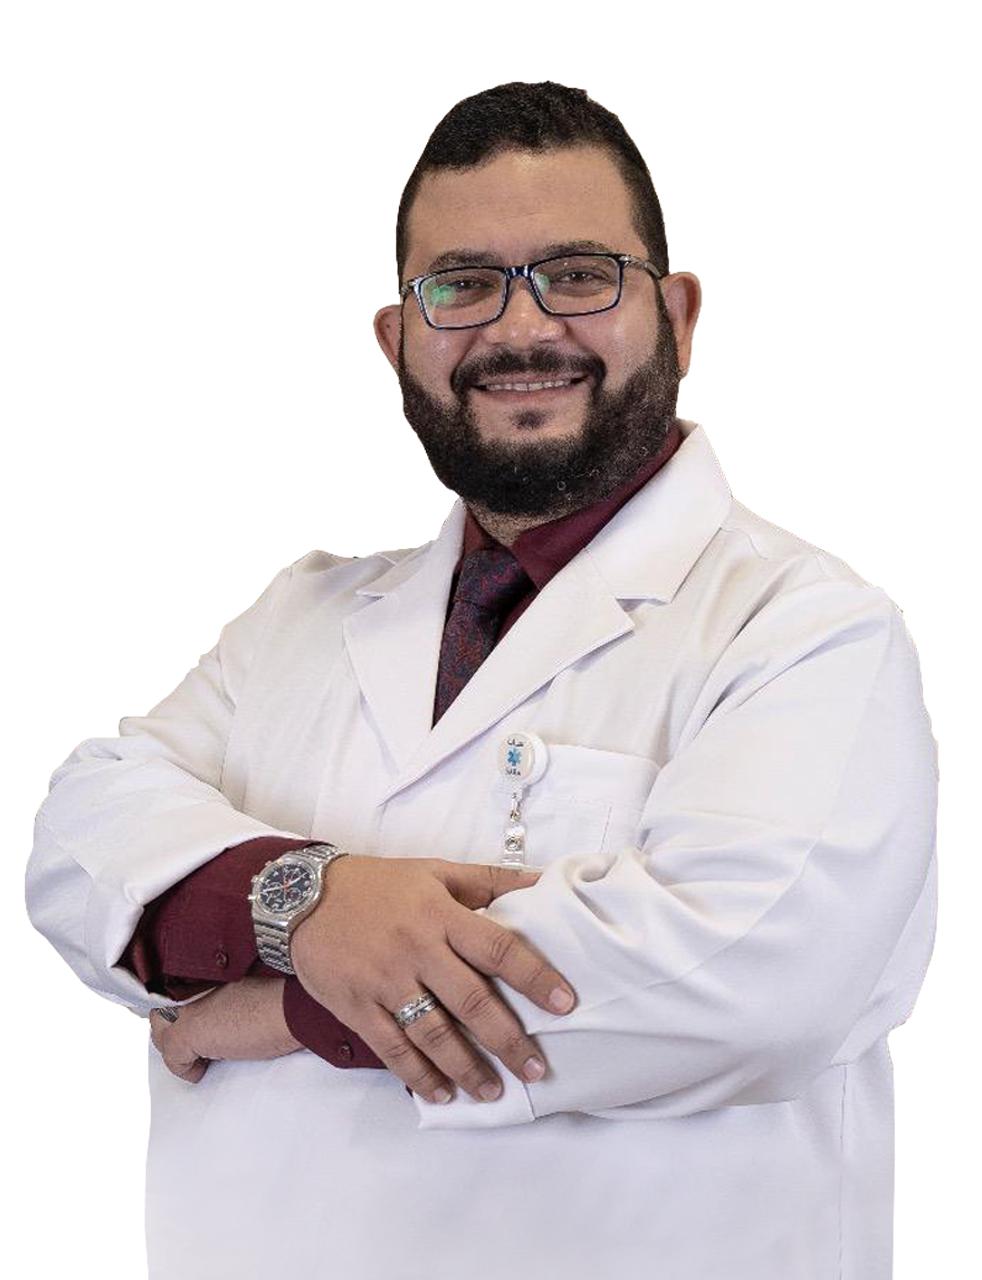 Dr. Mahmoud Mohamed Shehata